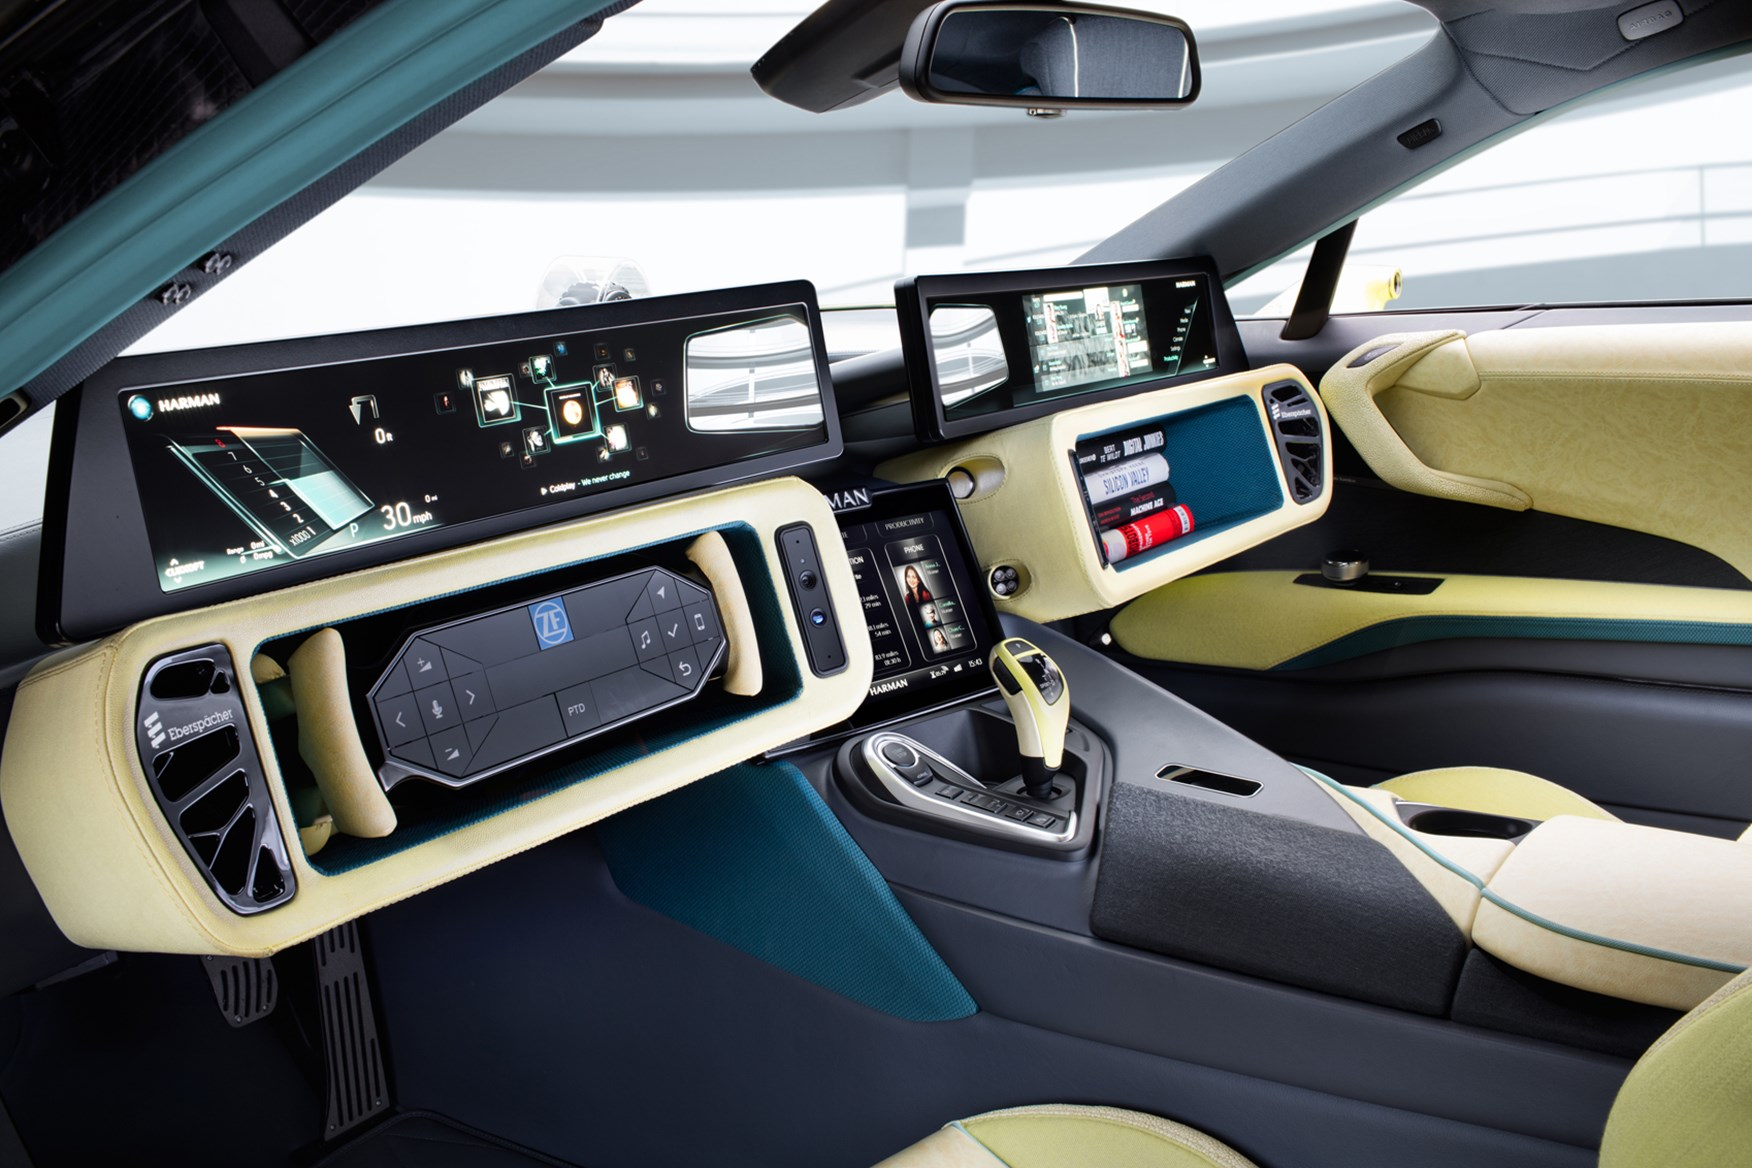 Rinspeed Etos based on BMW i Rear HD Wallpaper